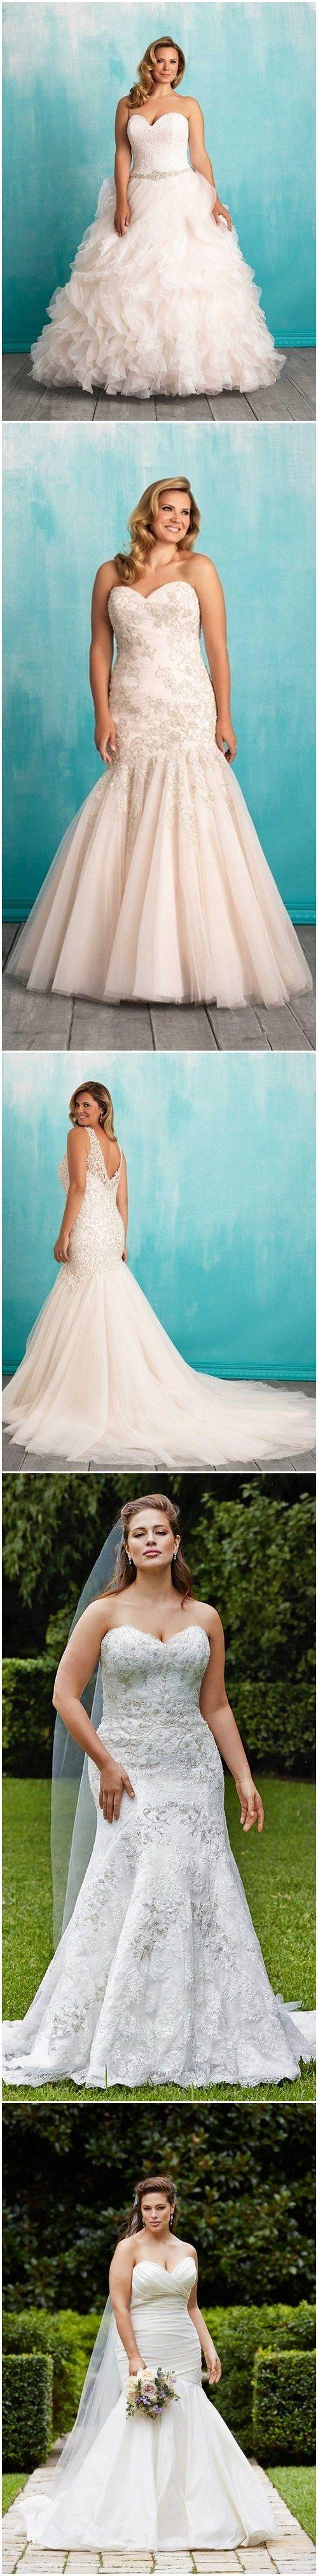 100 Gorgeous Plus-Size Wedding Dresses | Wedding dress, Wedding and ...